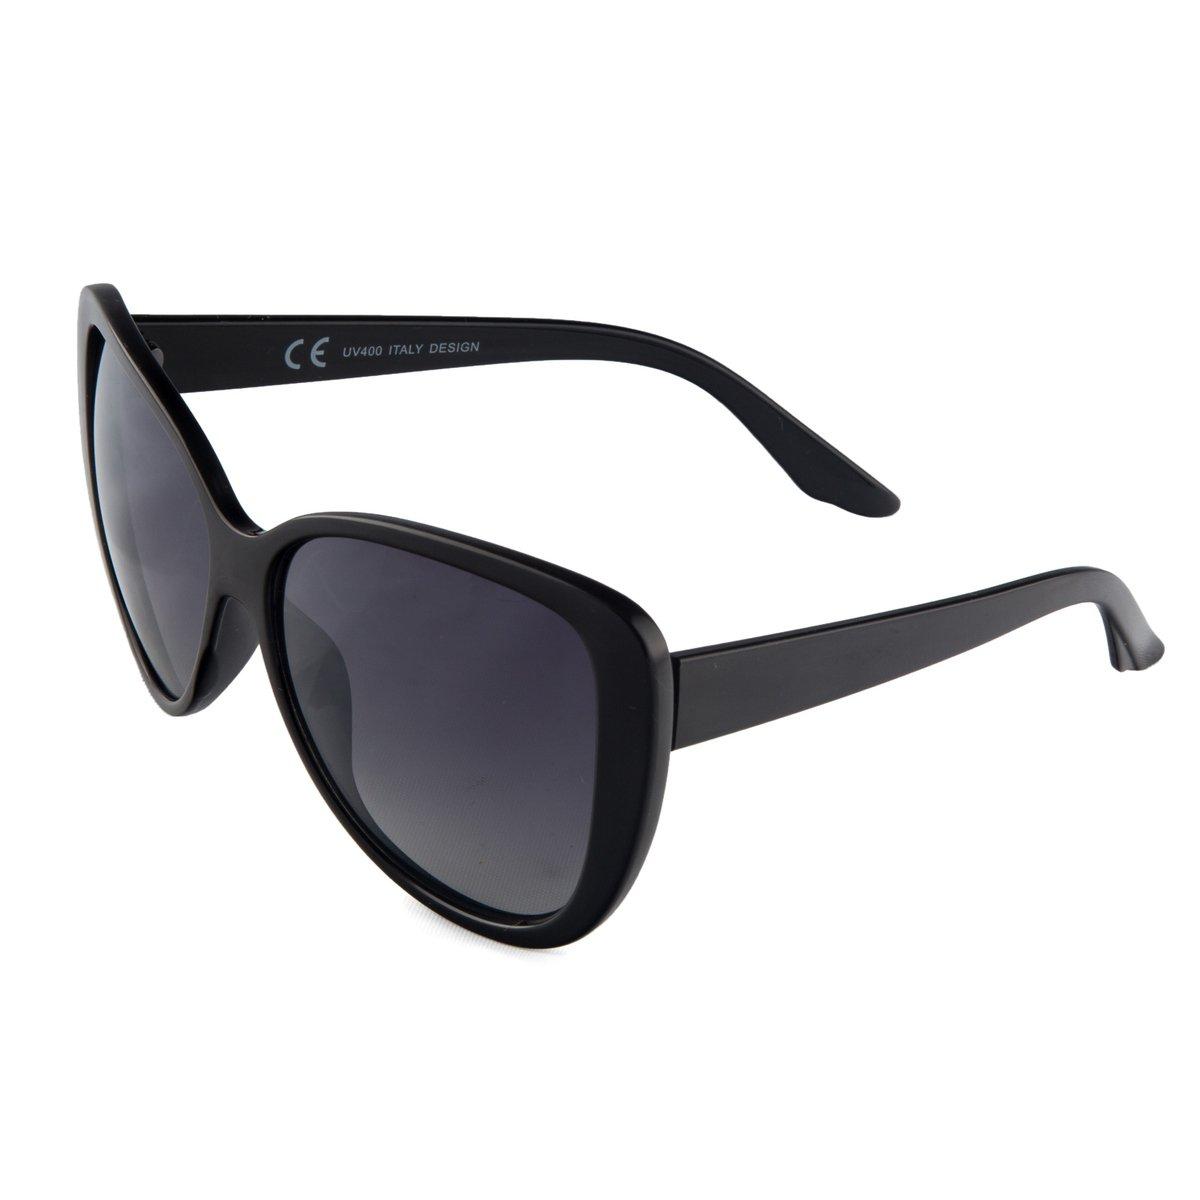 7d90dde5b69dc Óculos de Sol Khatto YD1286 - Compre Agora   Netshoes